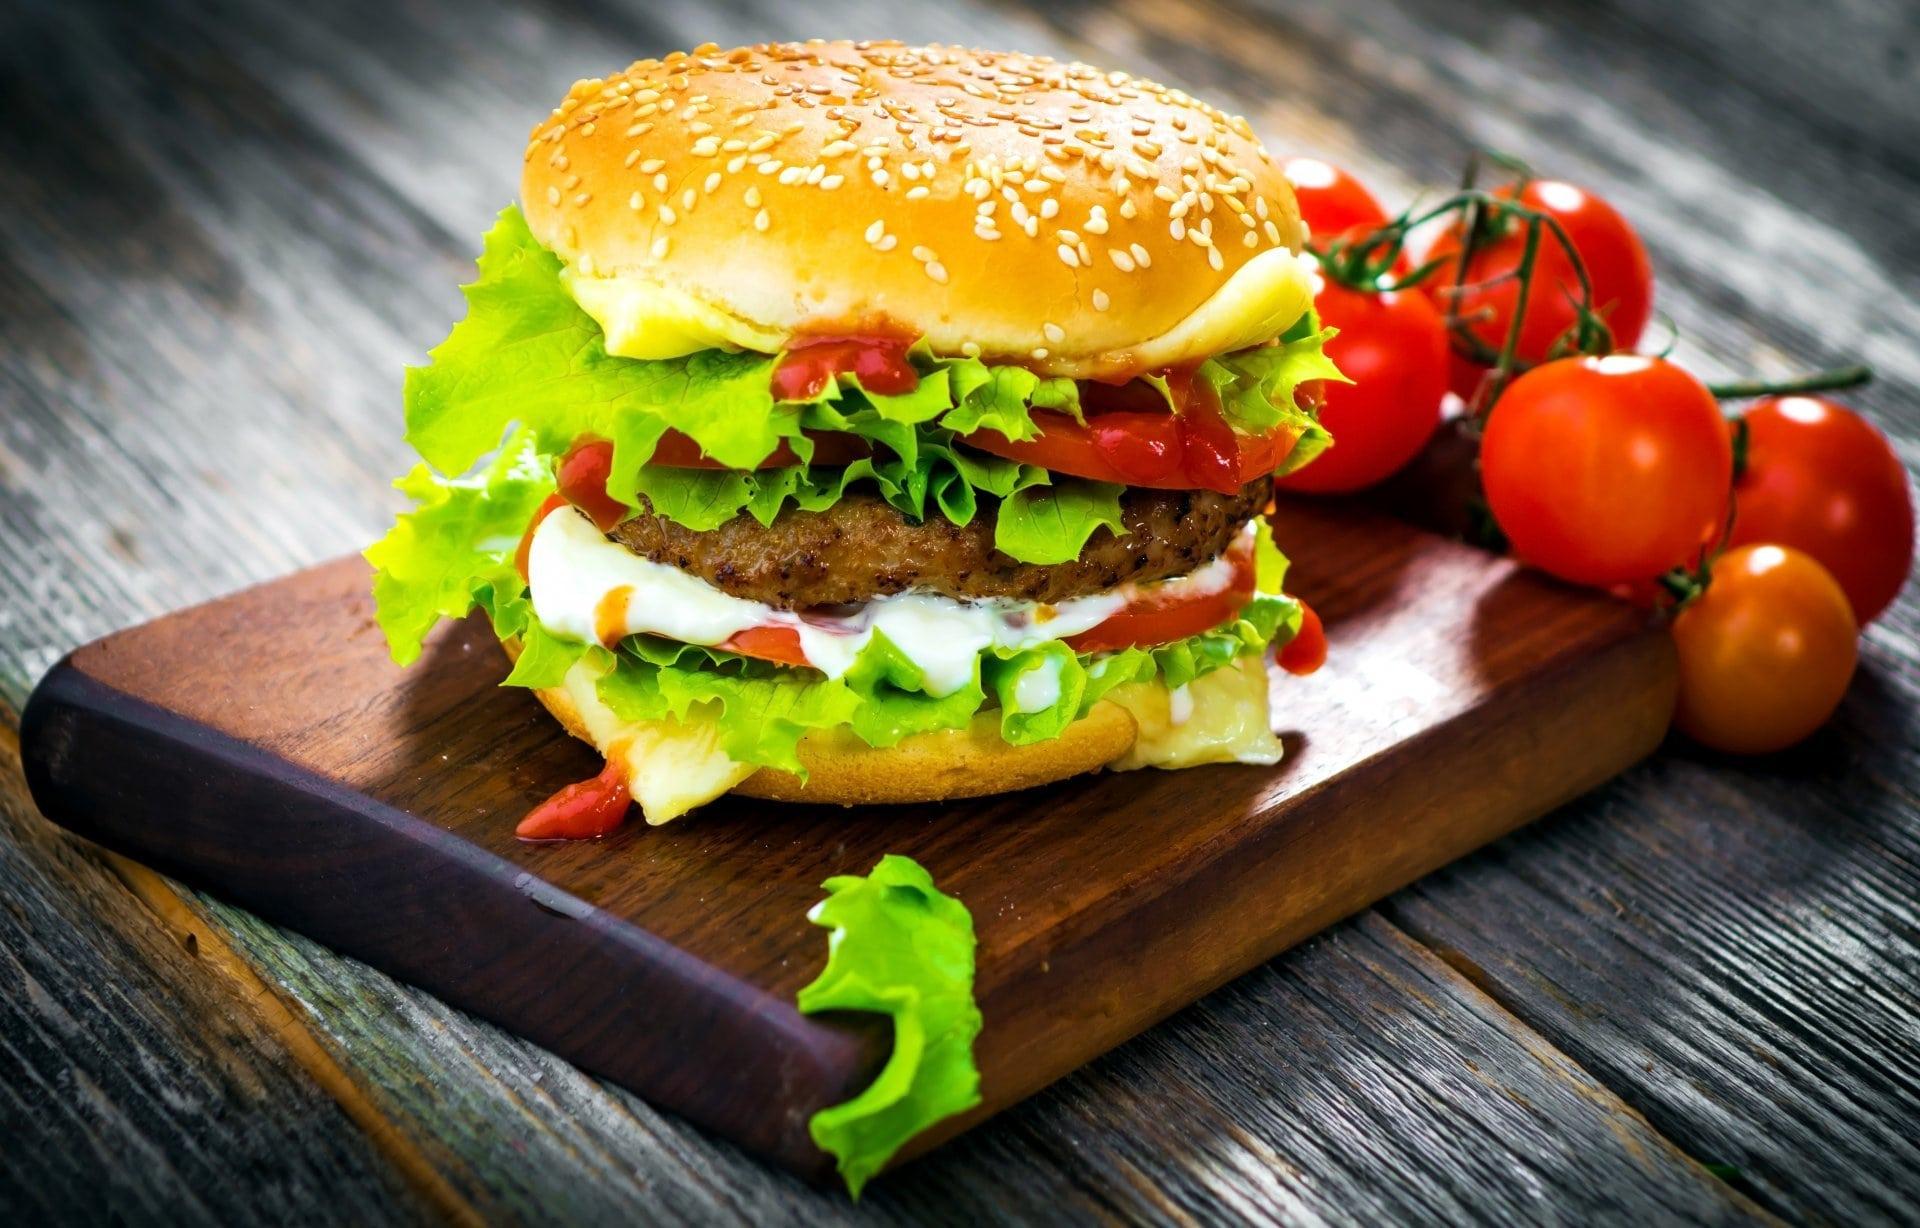 hamburger desktop hd wallpaper 61346